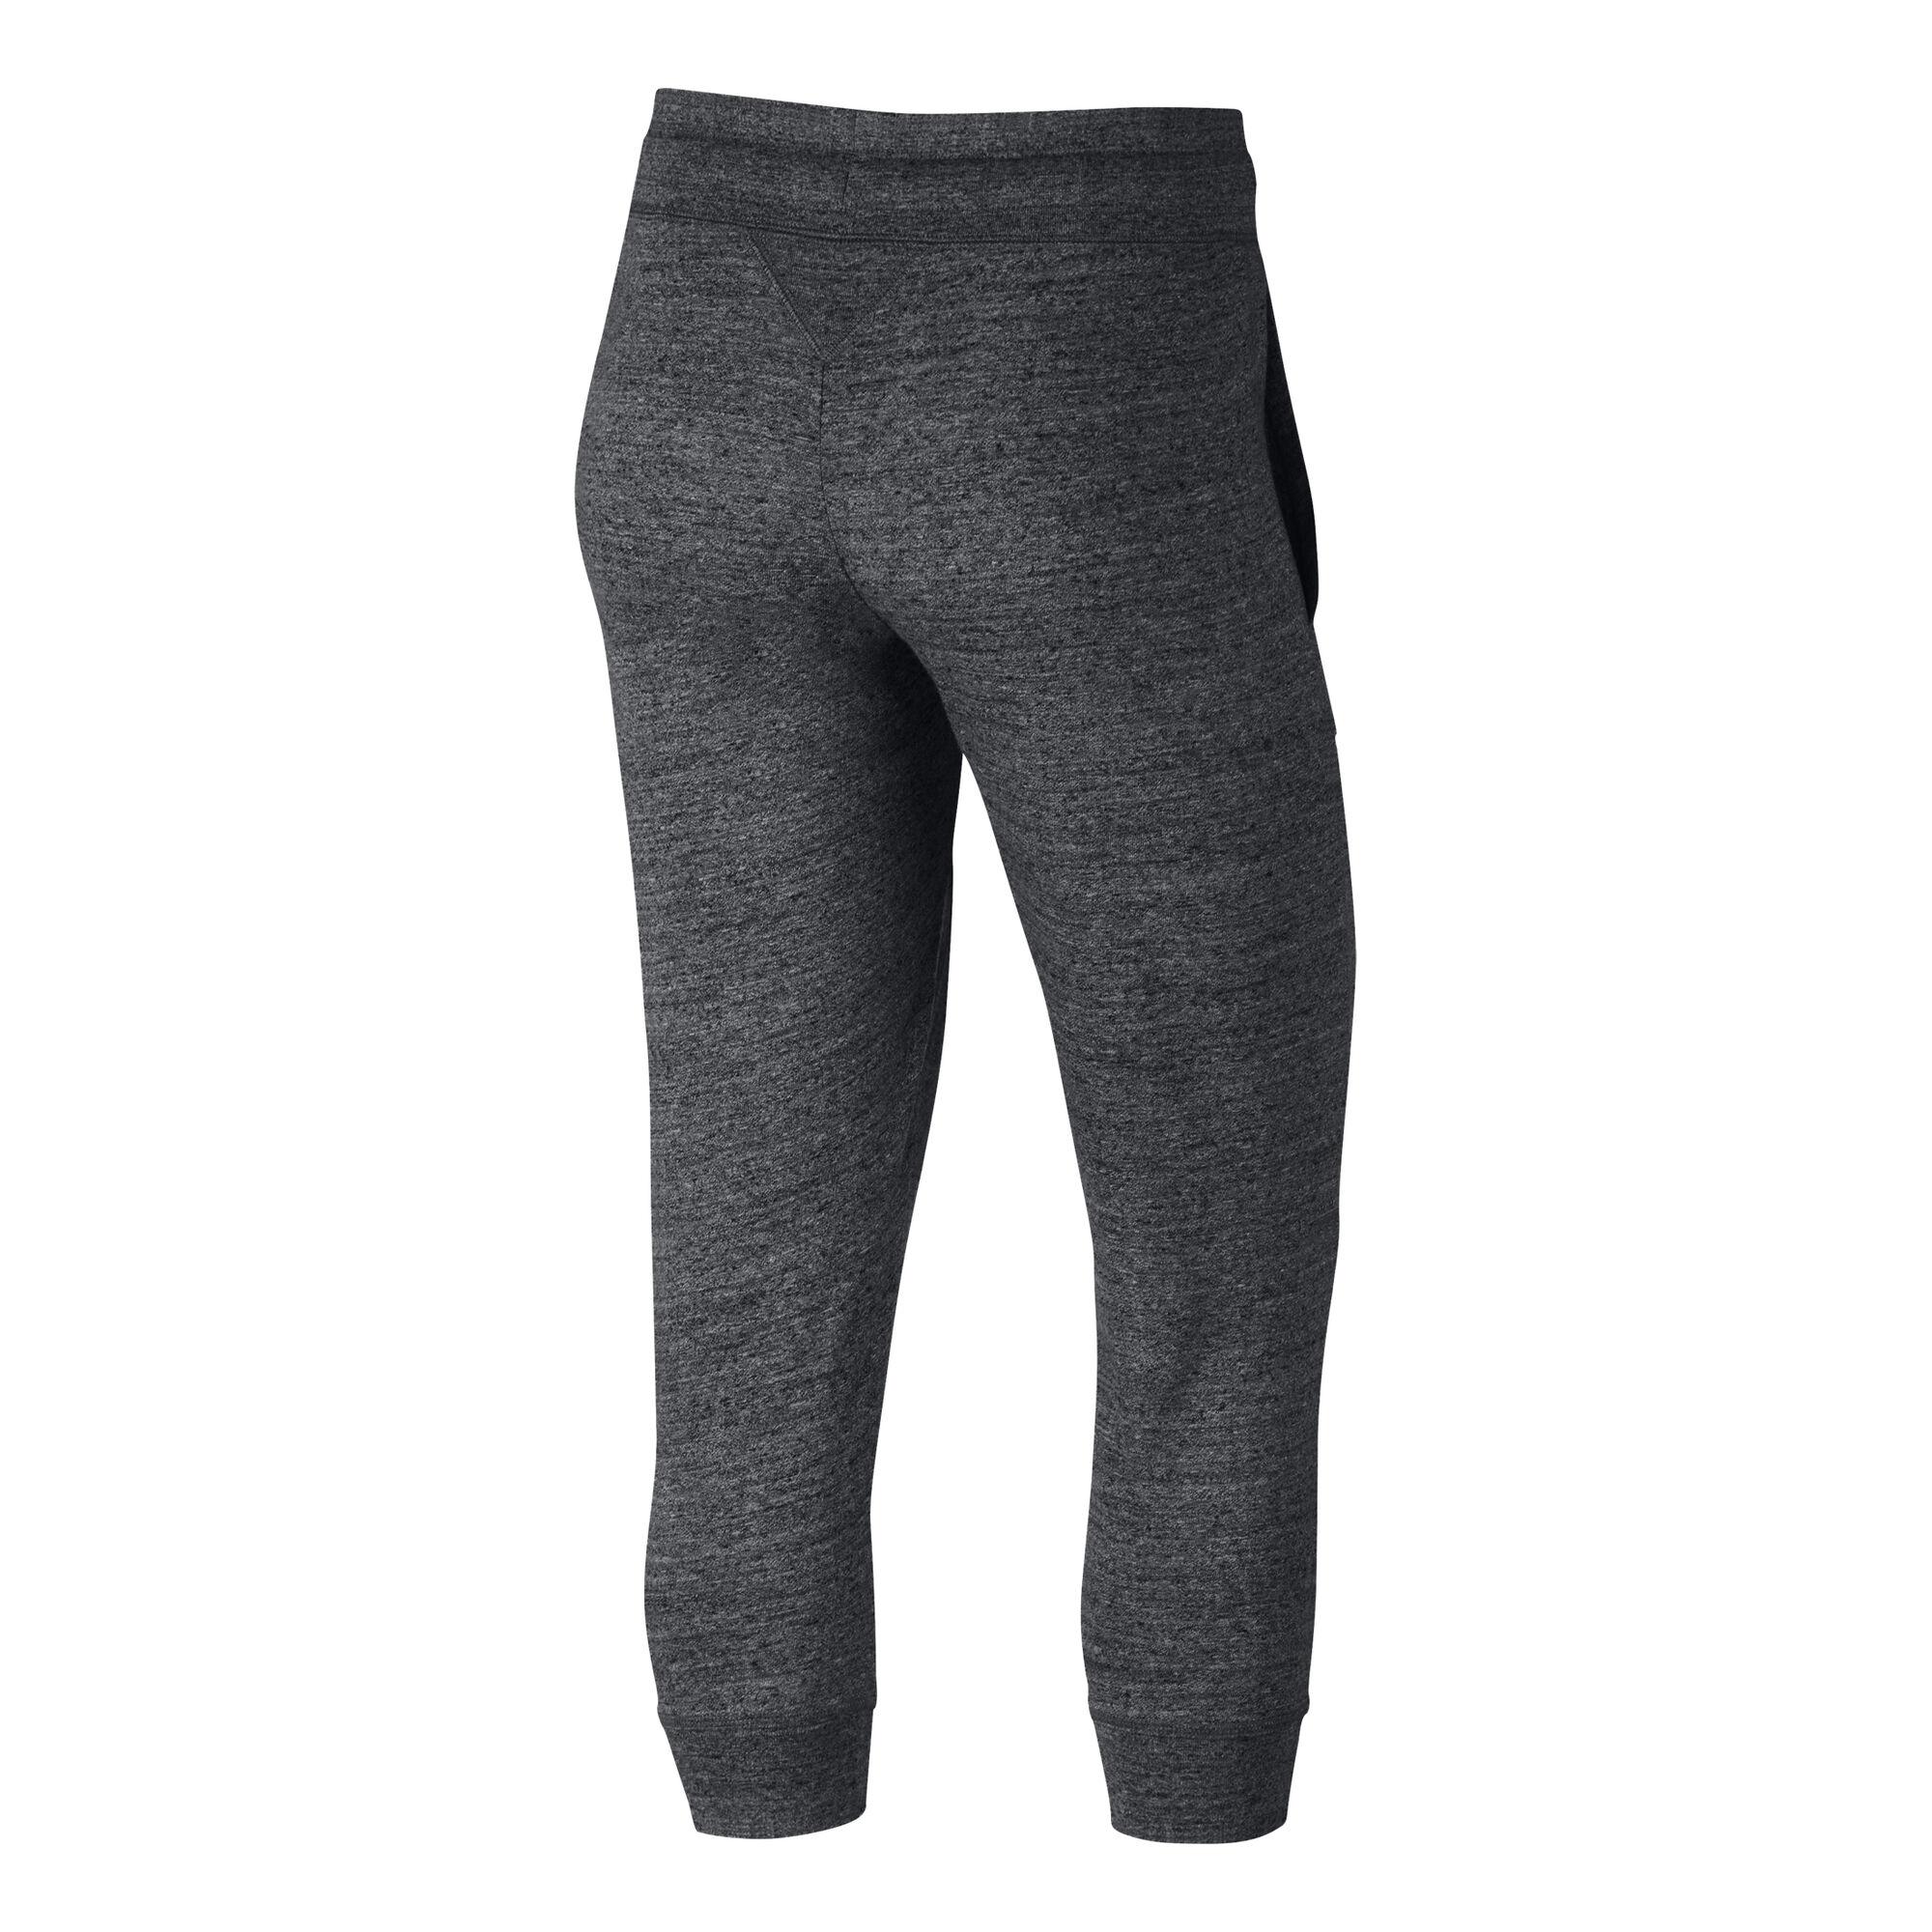 79691bb1005d13 Nike Sportswear Gym Vintage Pantacourt Femmes - Gris Foncé, Blanc ...